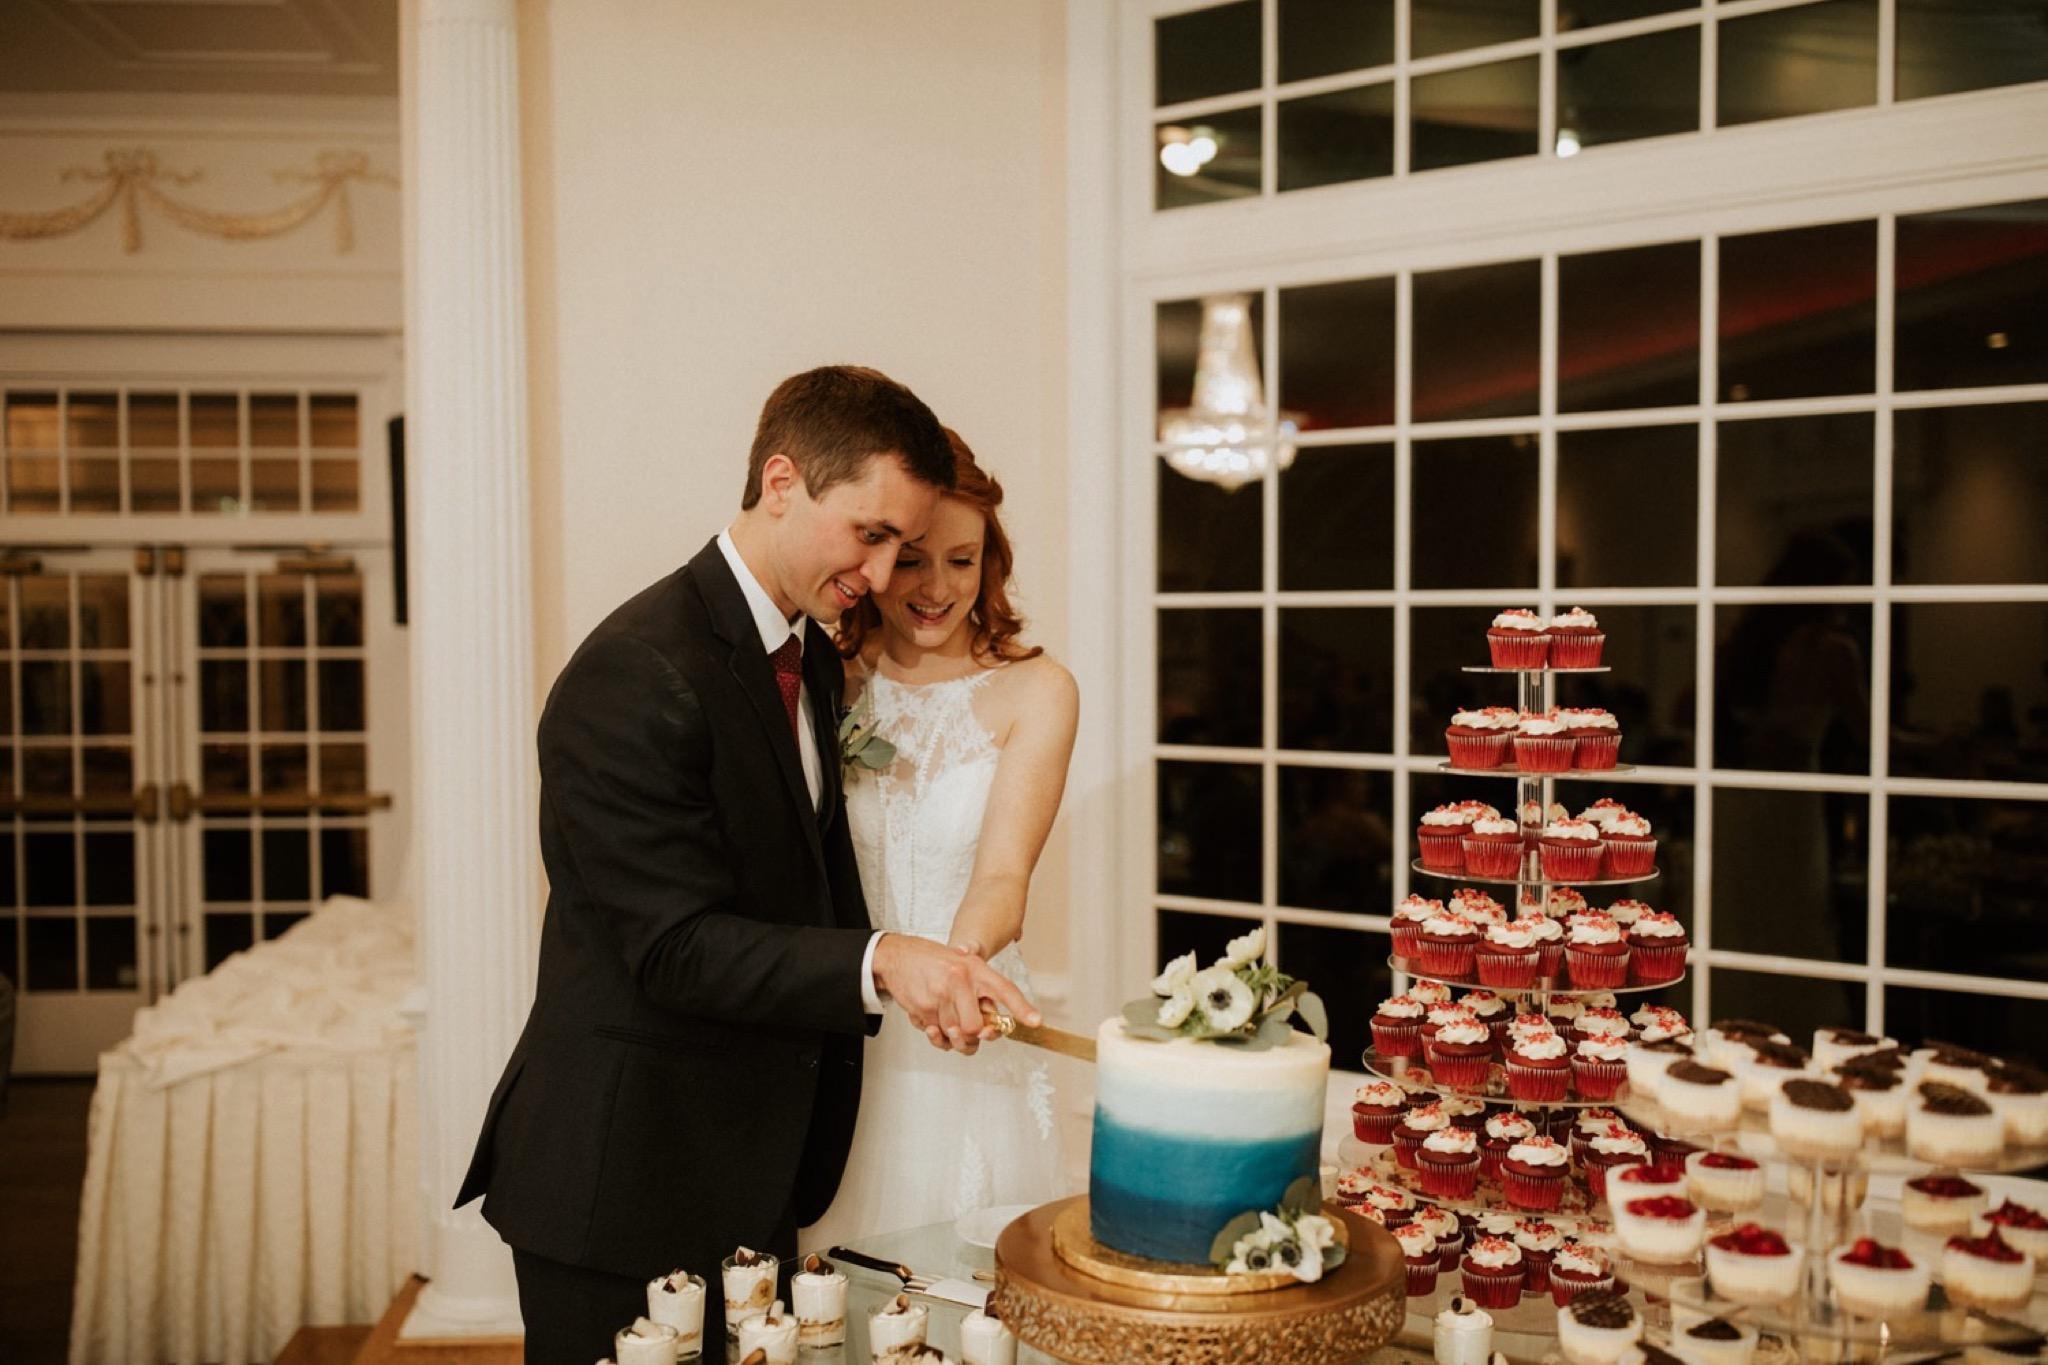 84_West Manor Estate Weddings - Pat Cori Photography-186_VirginiaWeddingPhotographer_WestManorEstate_Weddingvenue_Cakecutting.jpg